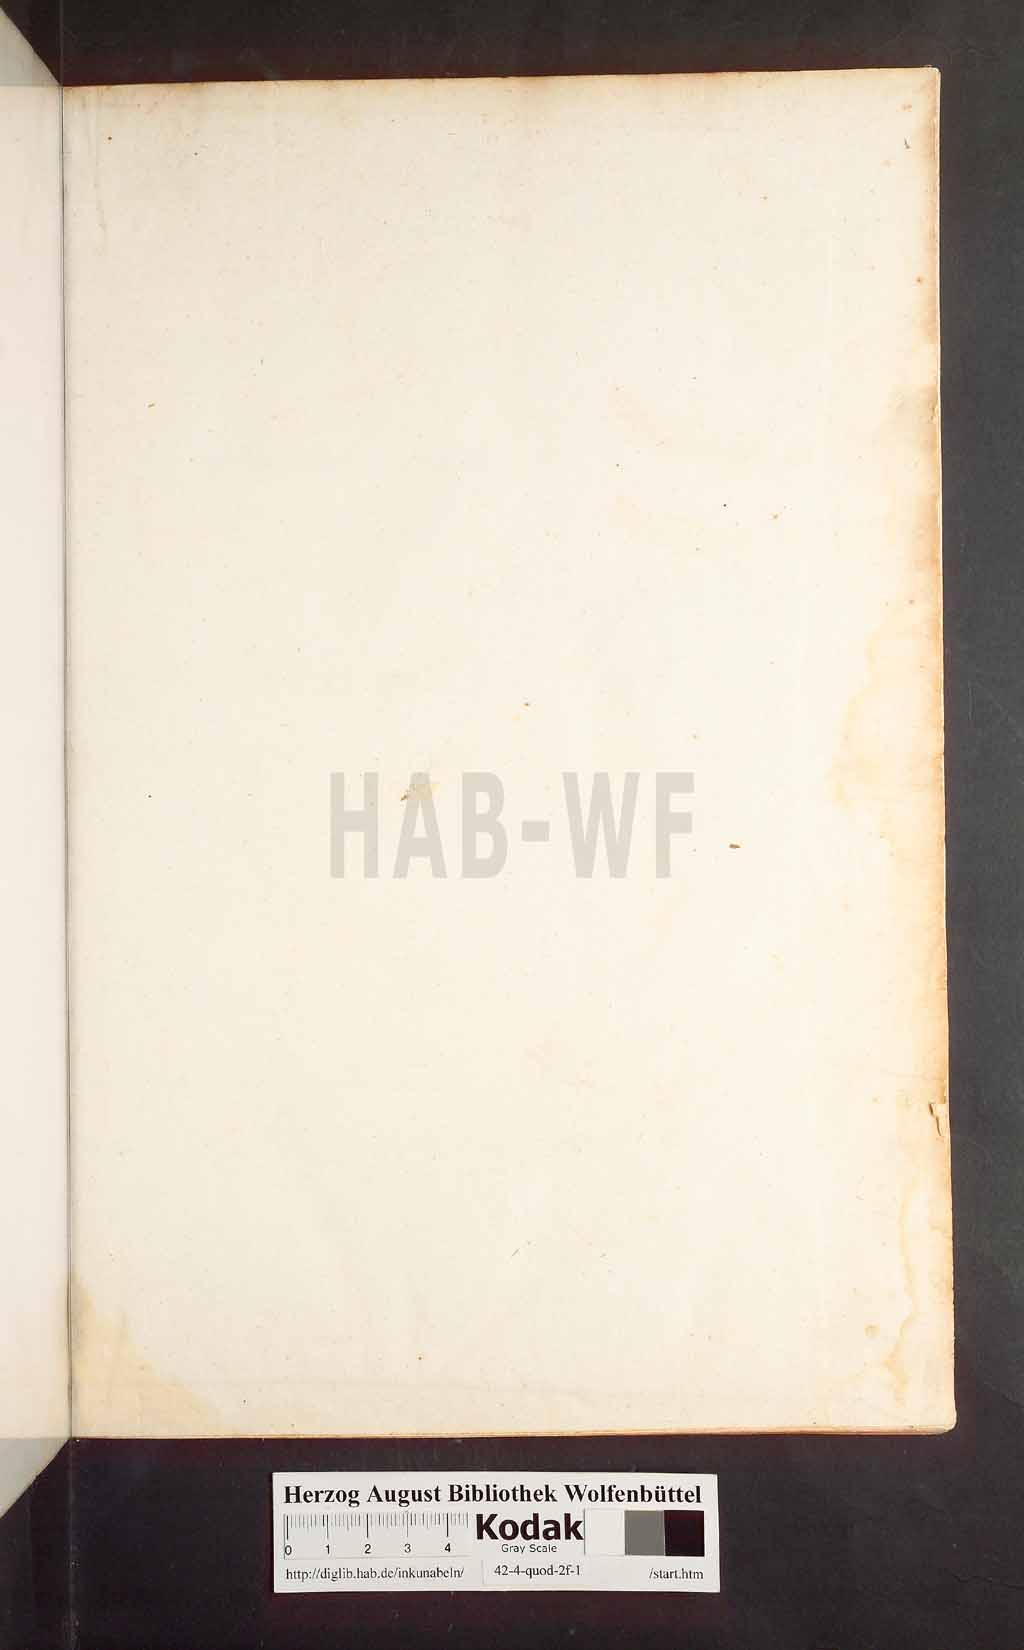 https://diglib.hab.de/inkunabeln/42-4-quod-2f-1/00001.jpg